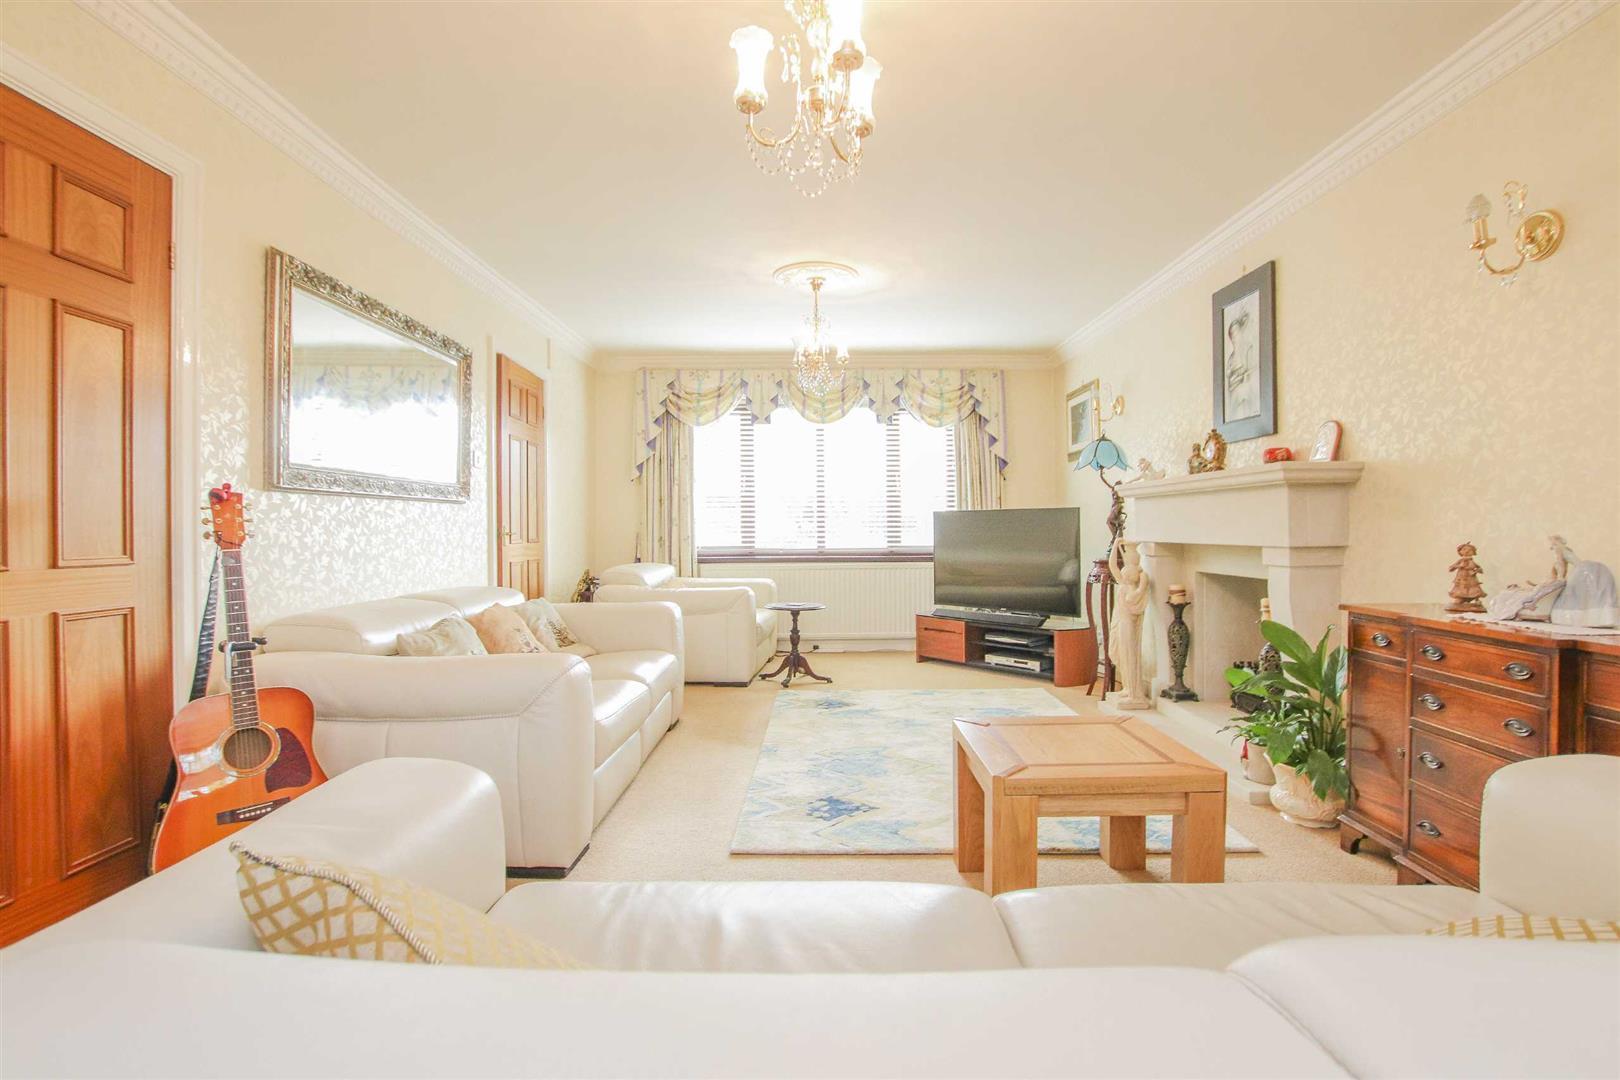 4 Bedroom Detached House For Sale - Image 12